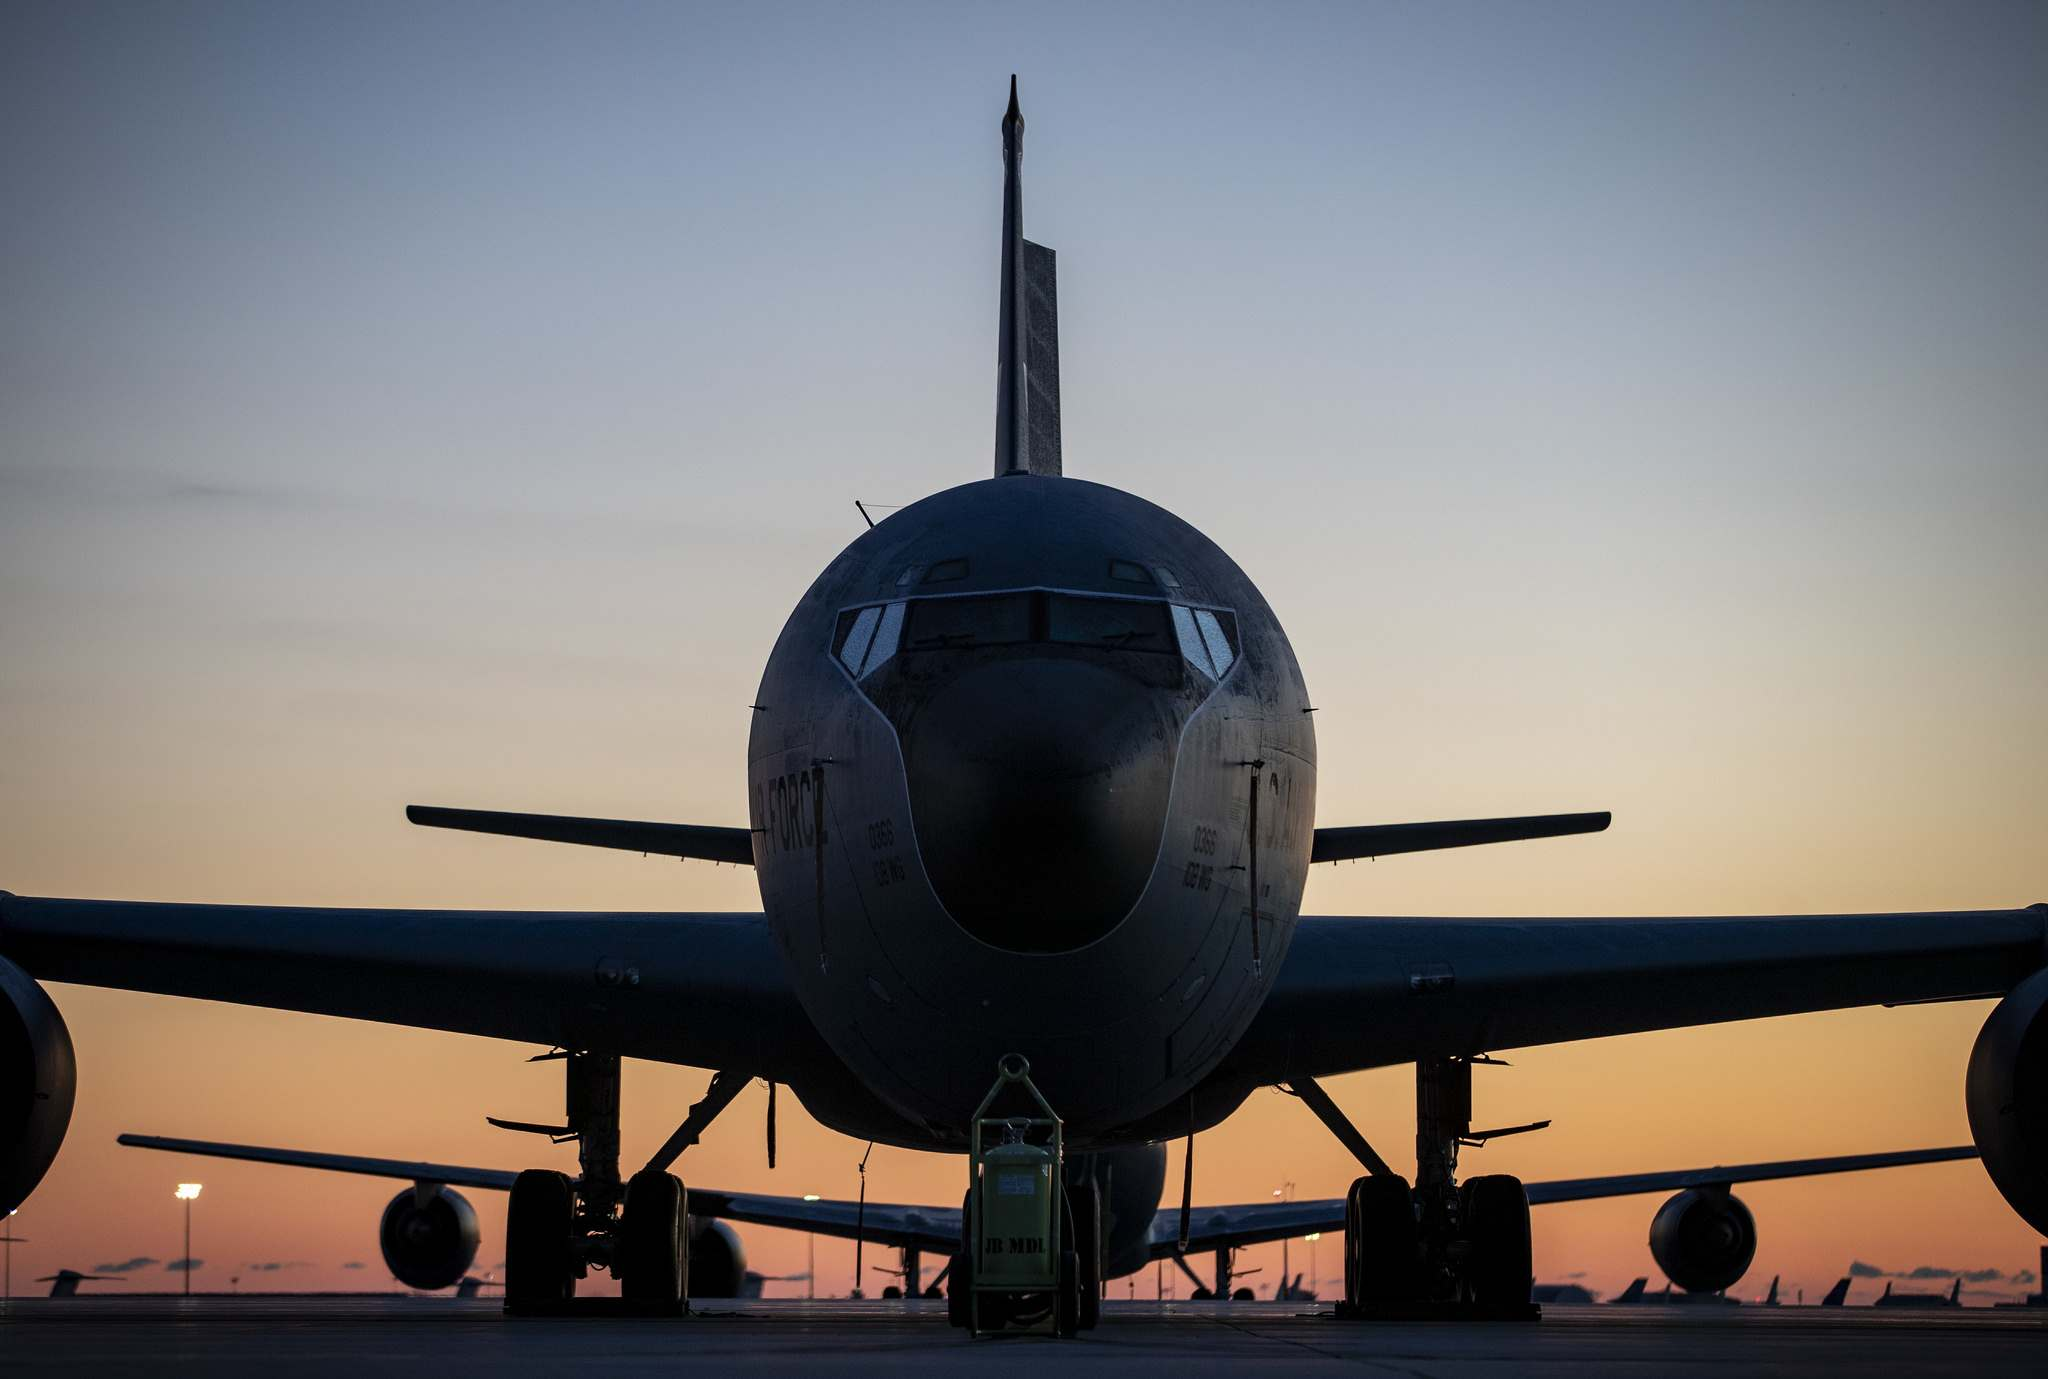 boeing kc 1357 Boeing KC 135R Stratotanker Photos